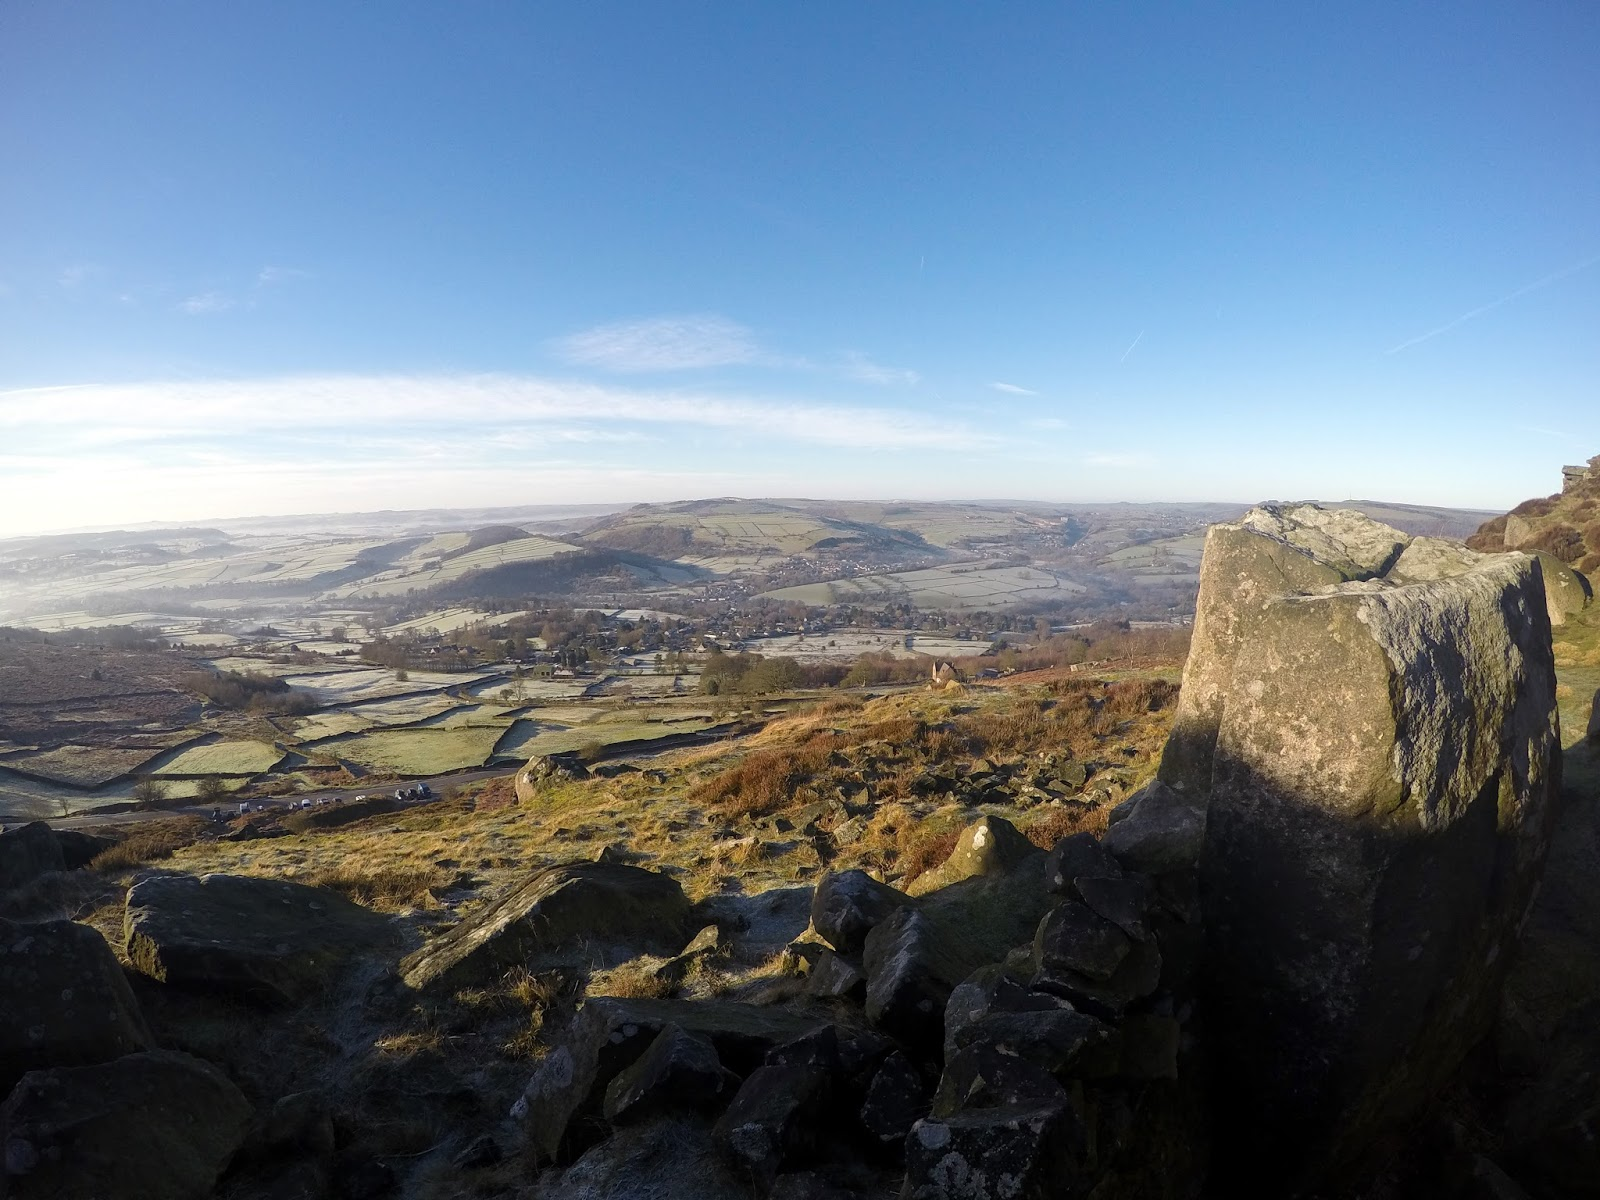 Froggart, Curbar, Climbing, bouldering, peak district, uk, england, outdoors, exploring, adventure, derbyshire, travel,